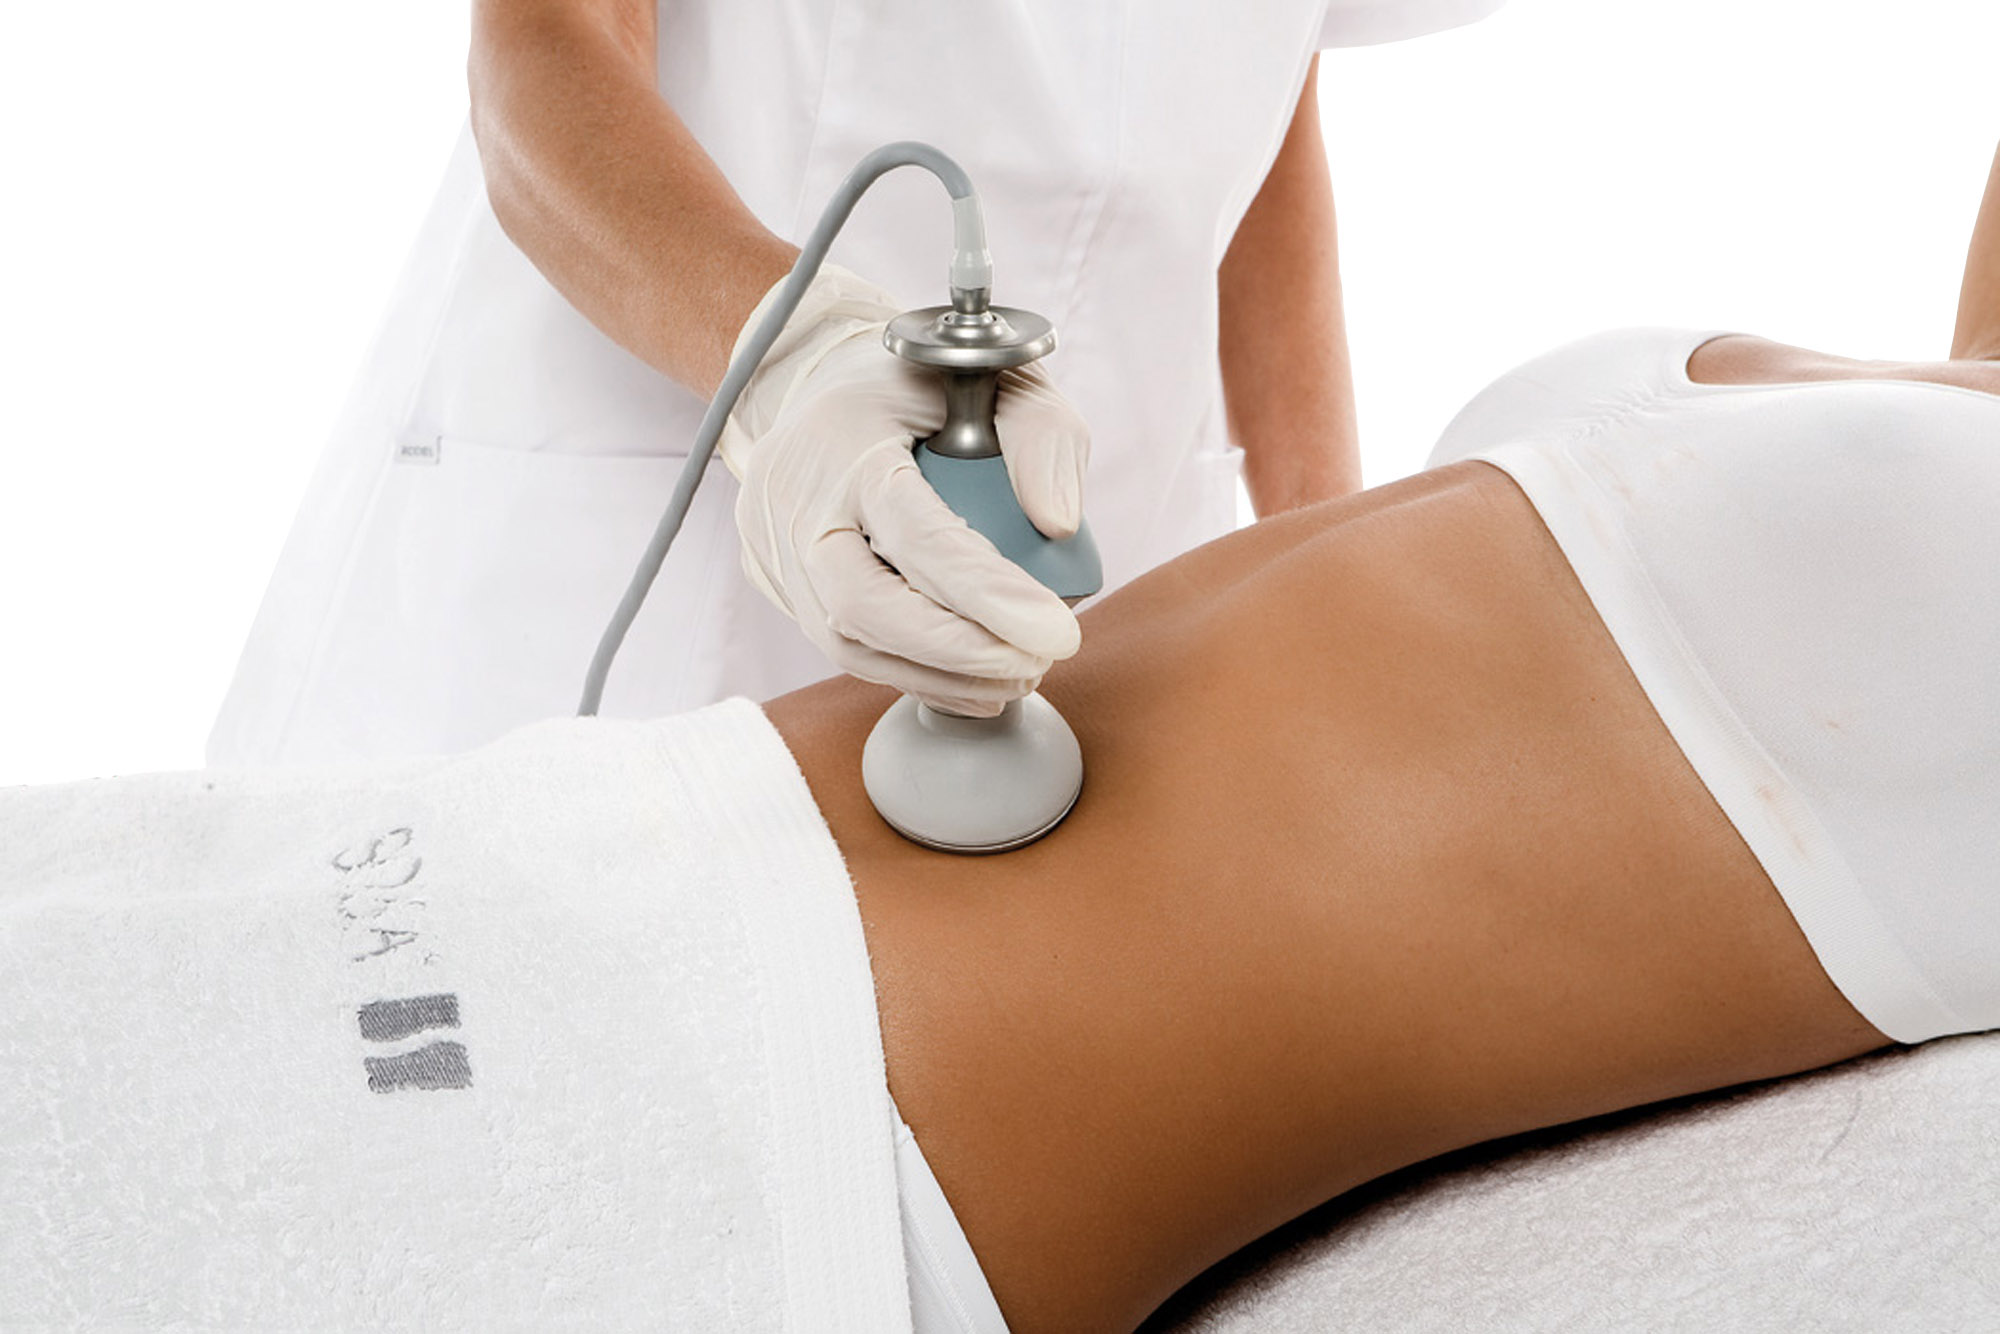 Процедура вакуумного массажа